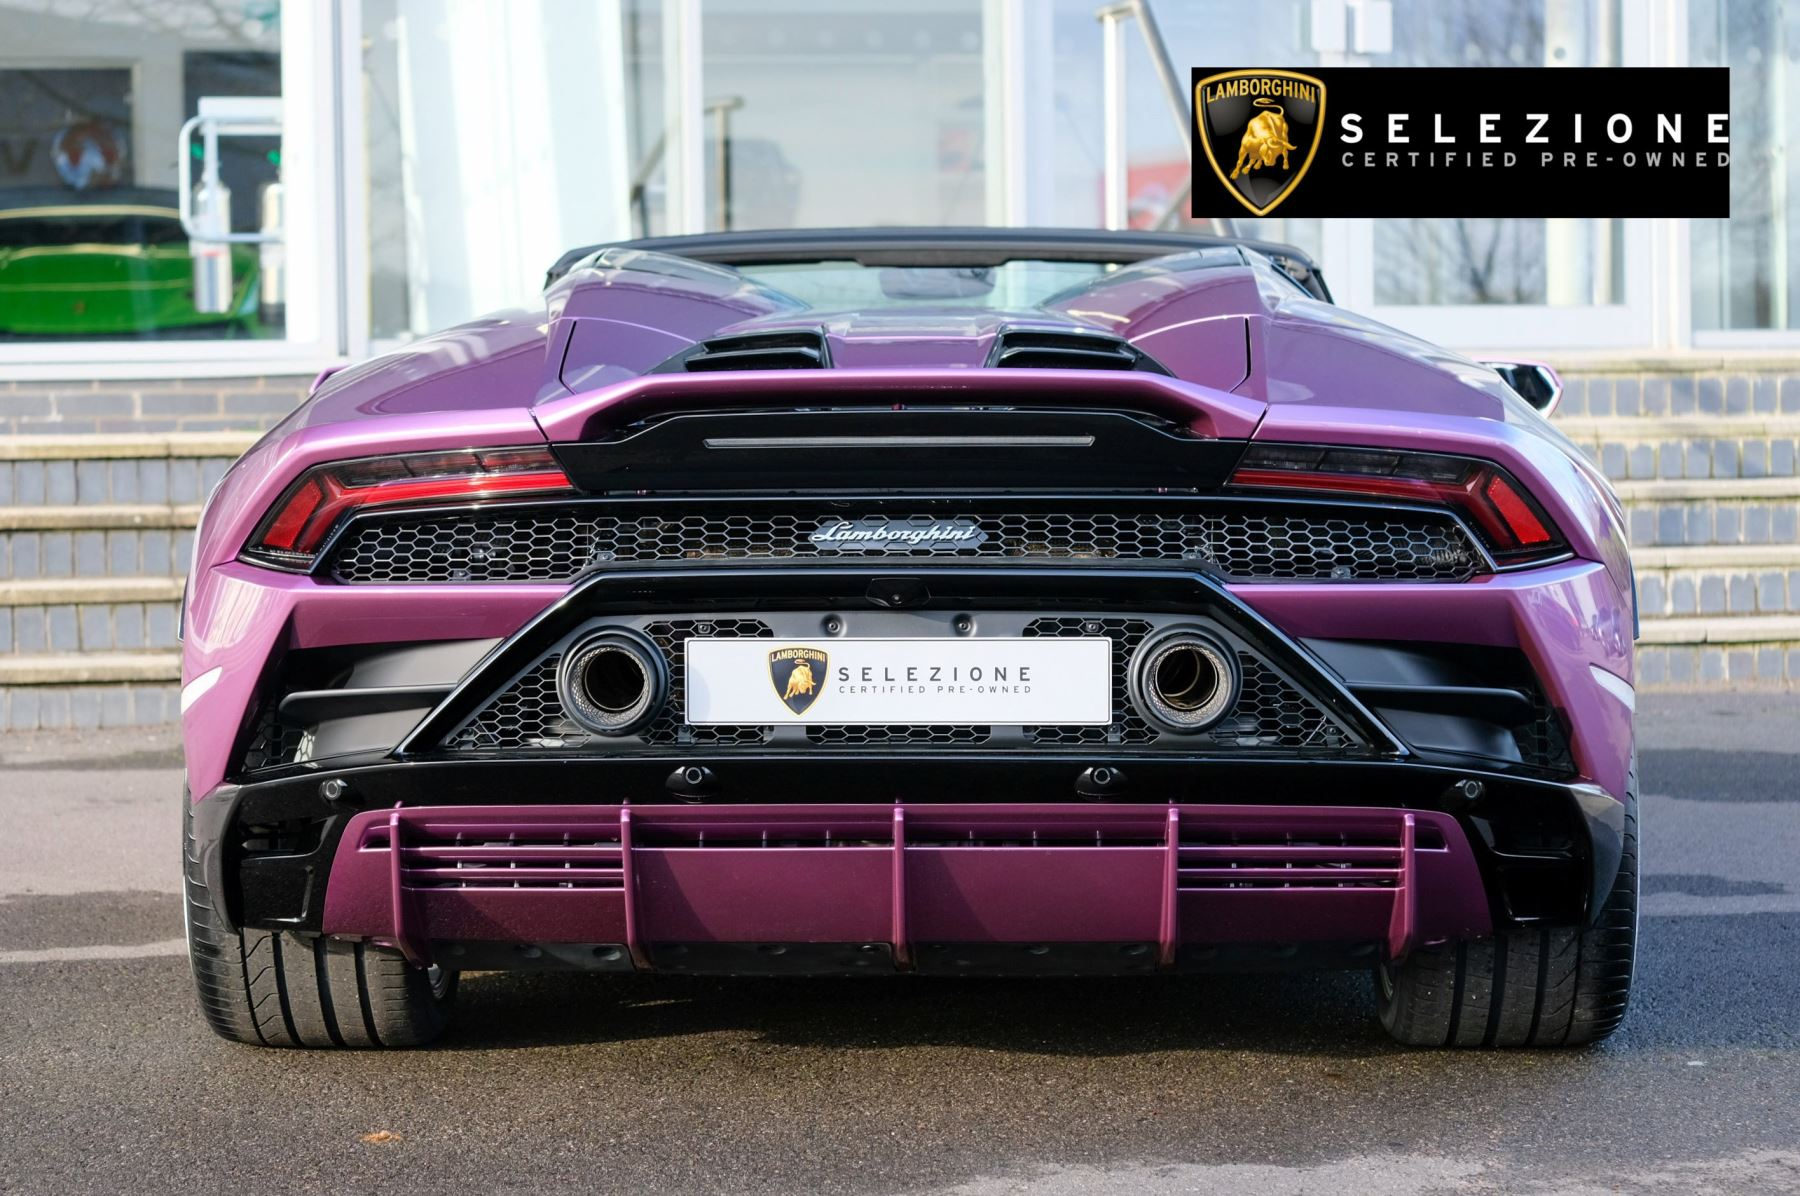 Lamborghini Huracan EVO Spyder 5.2 V10 640 2dr Auto AWD image 4